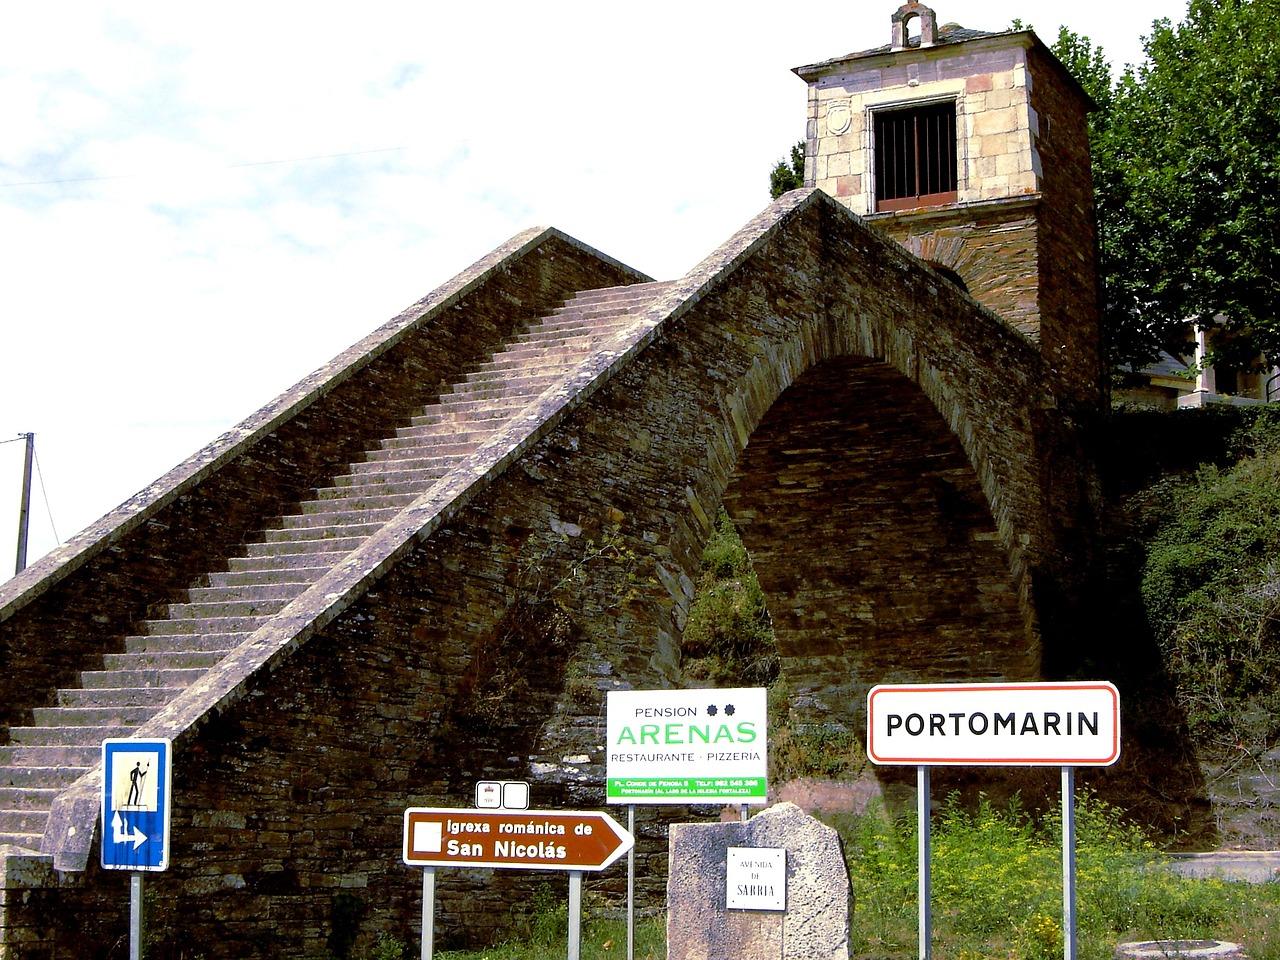 Lugo_Portomarin